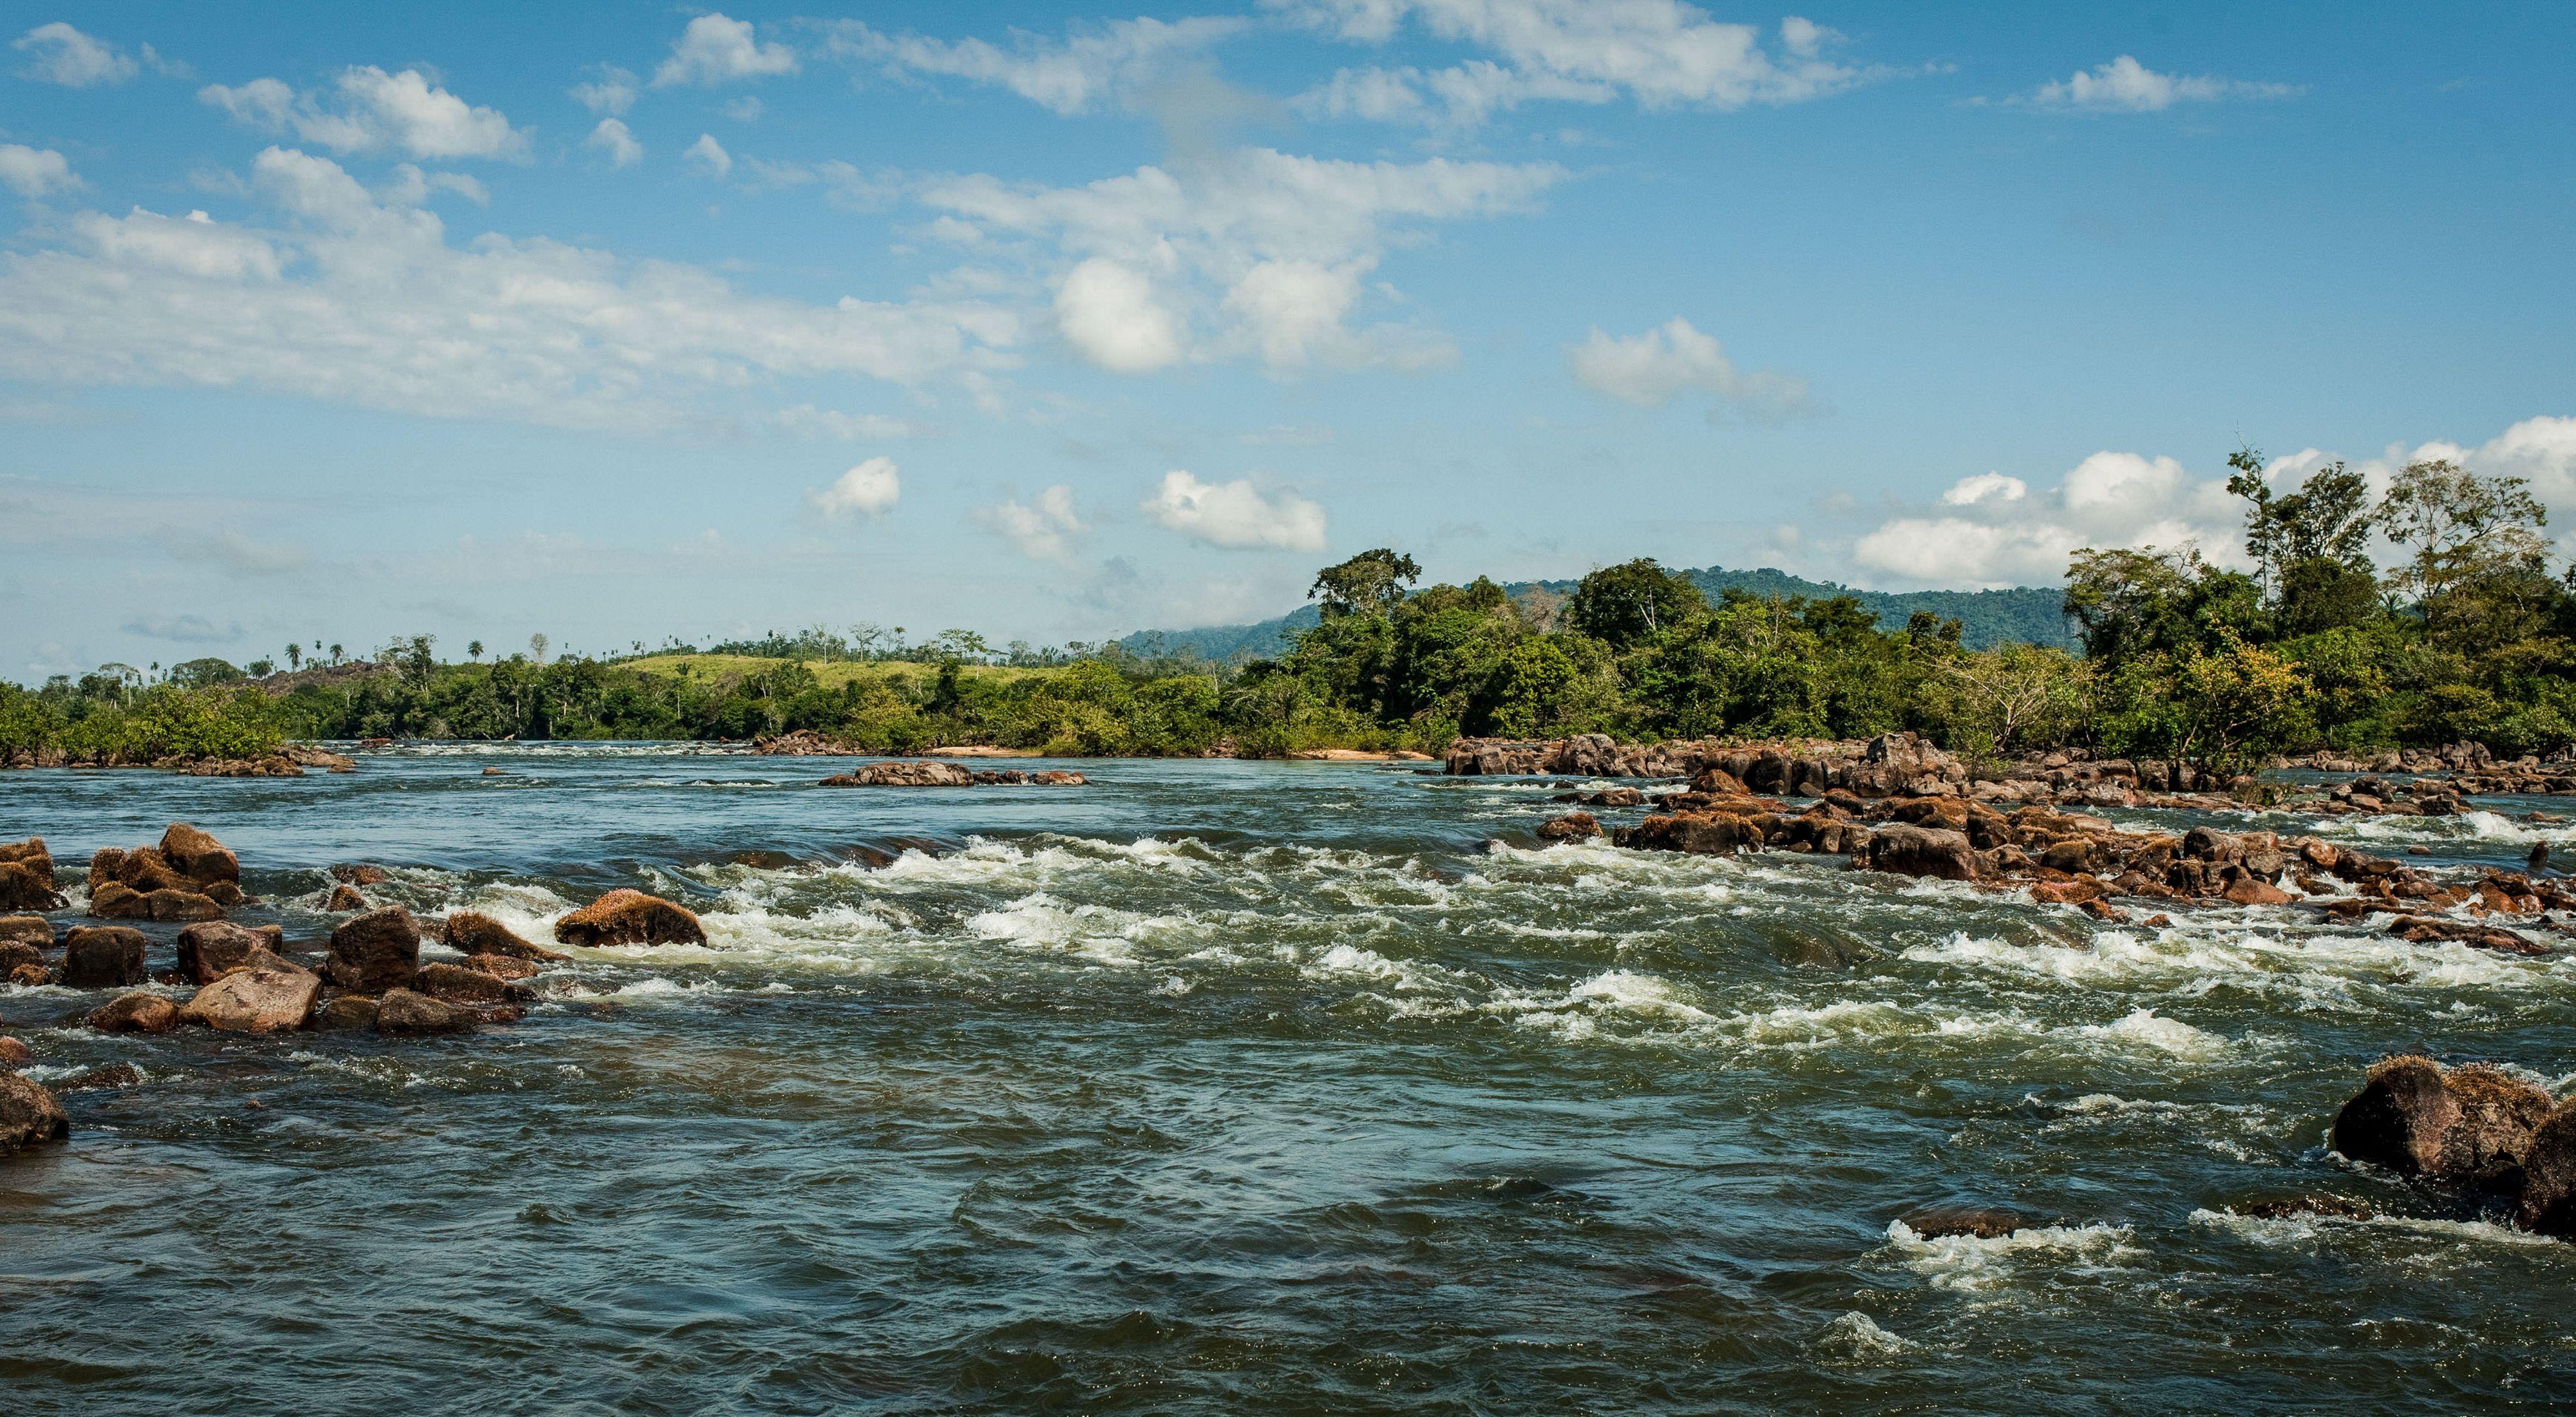 Xingu' river, Brasil